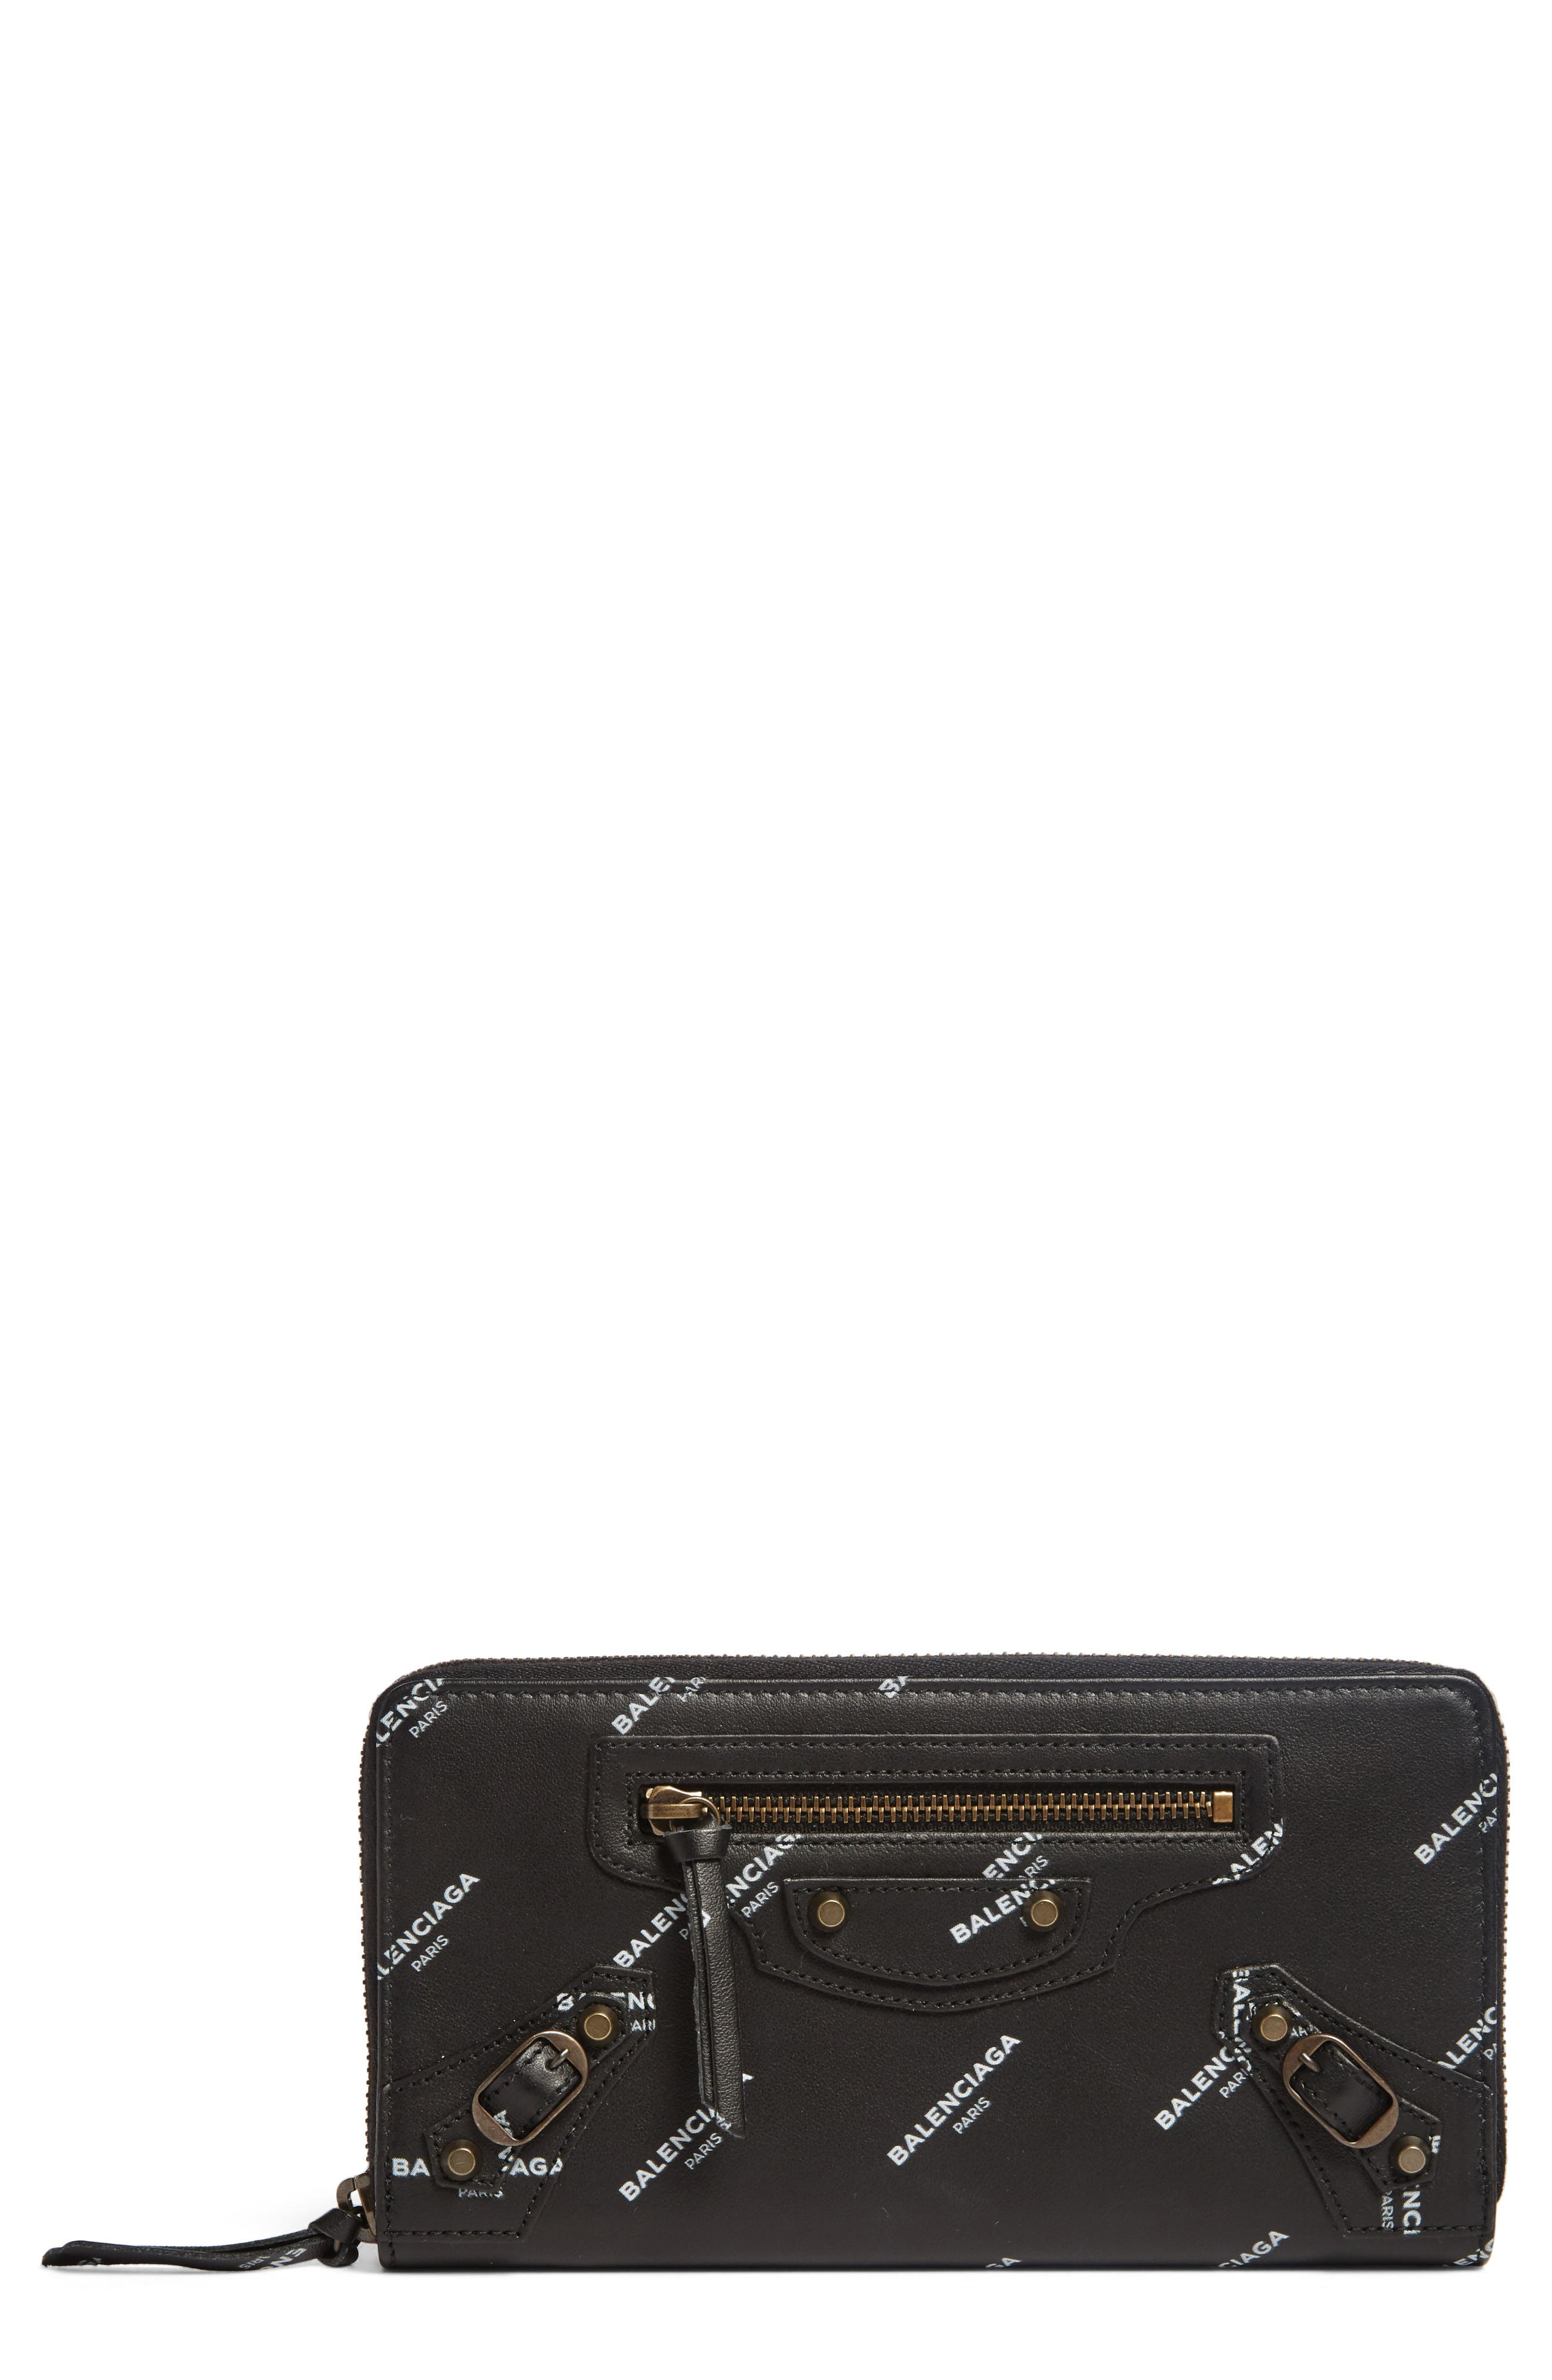 Balenciaga Classic Zip Around Leather Wallet